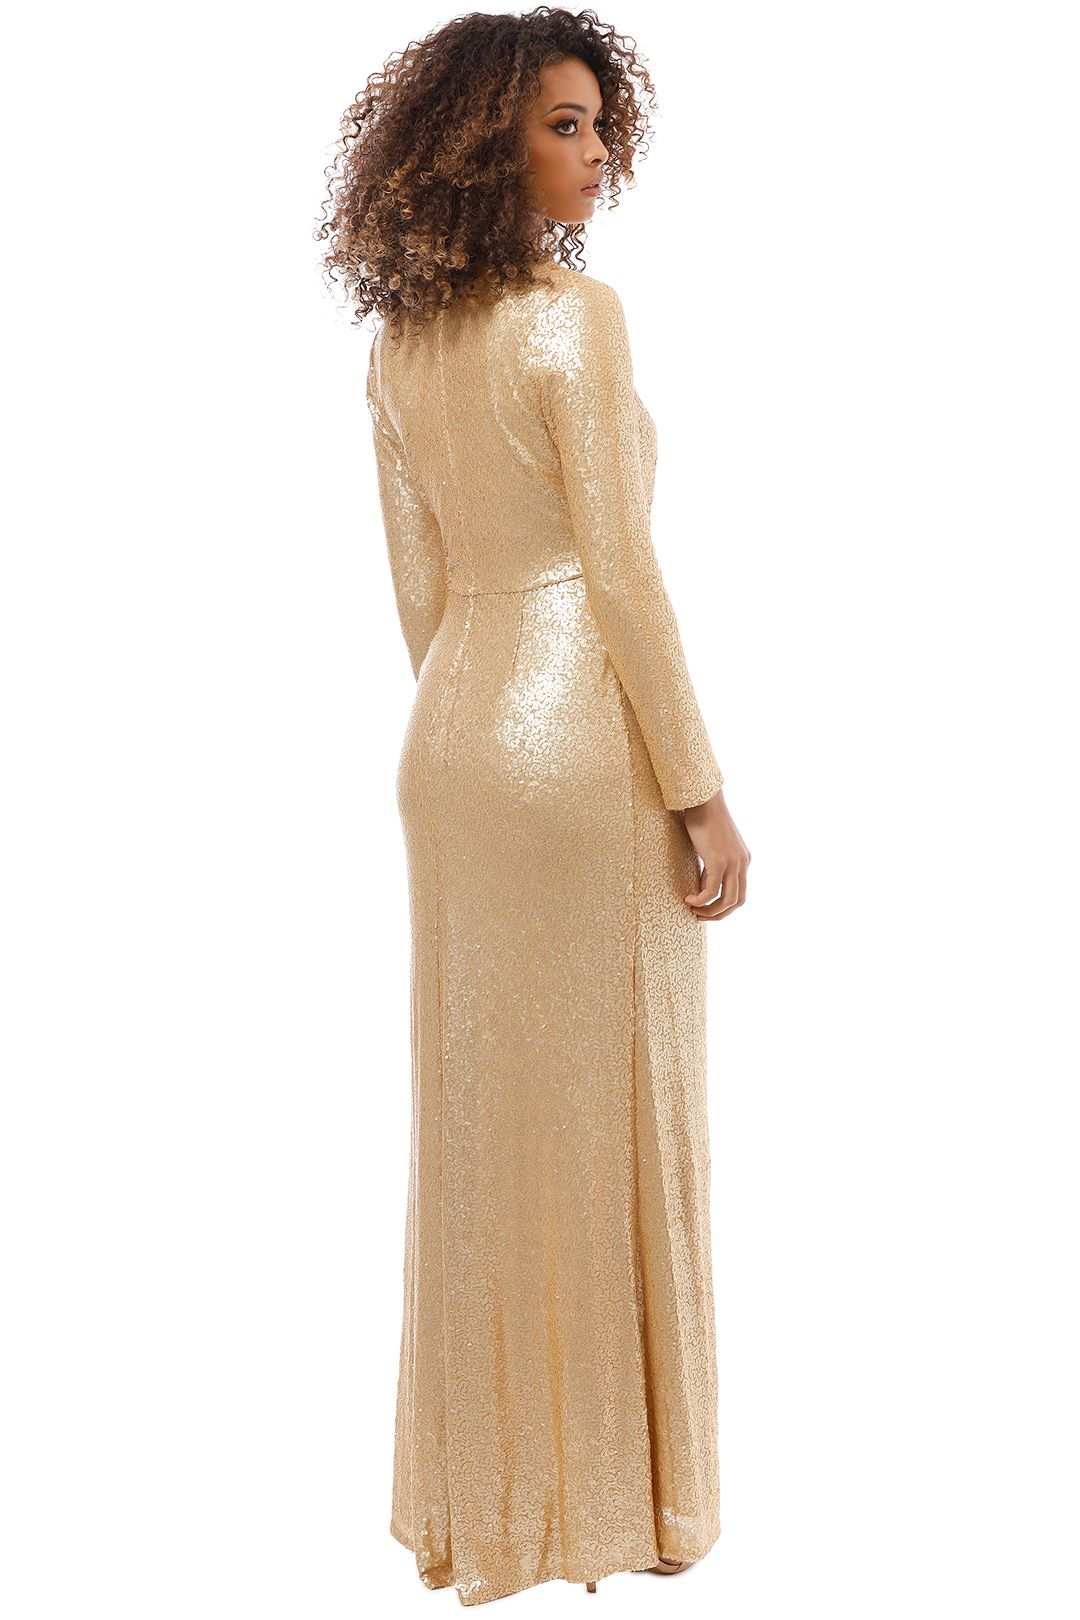 Tadashi Shoji - Angelique Gold Drape Gown - Gold - Back